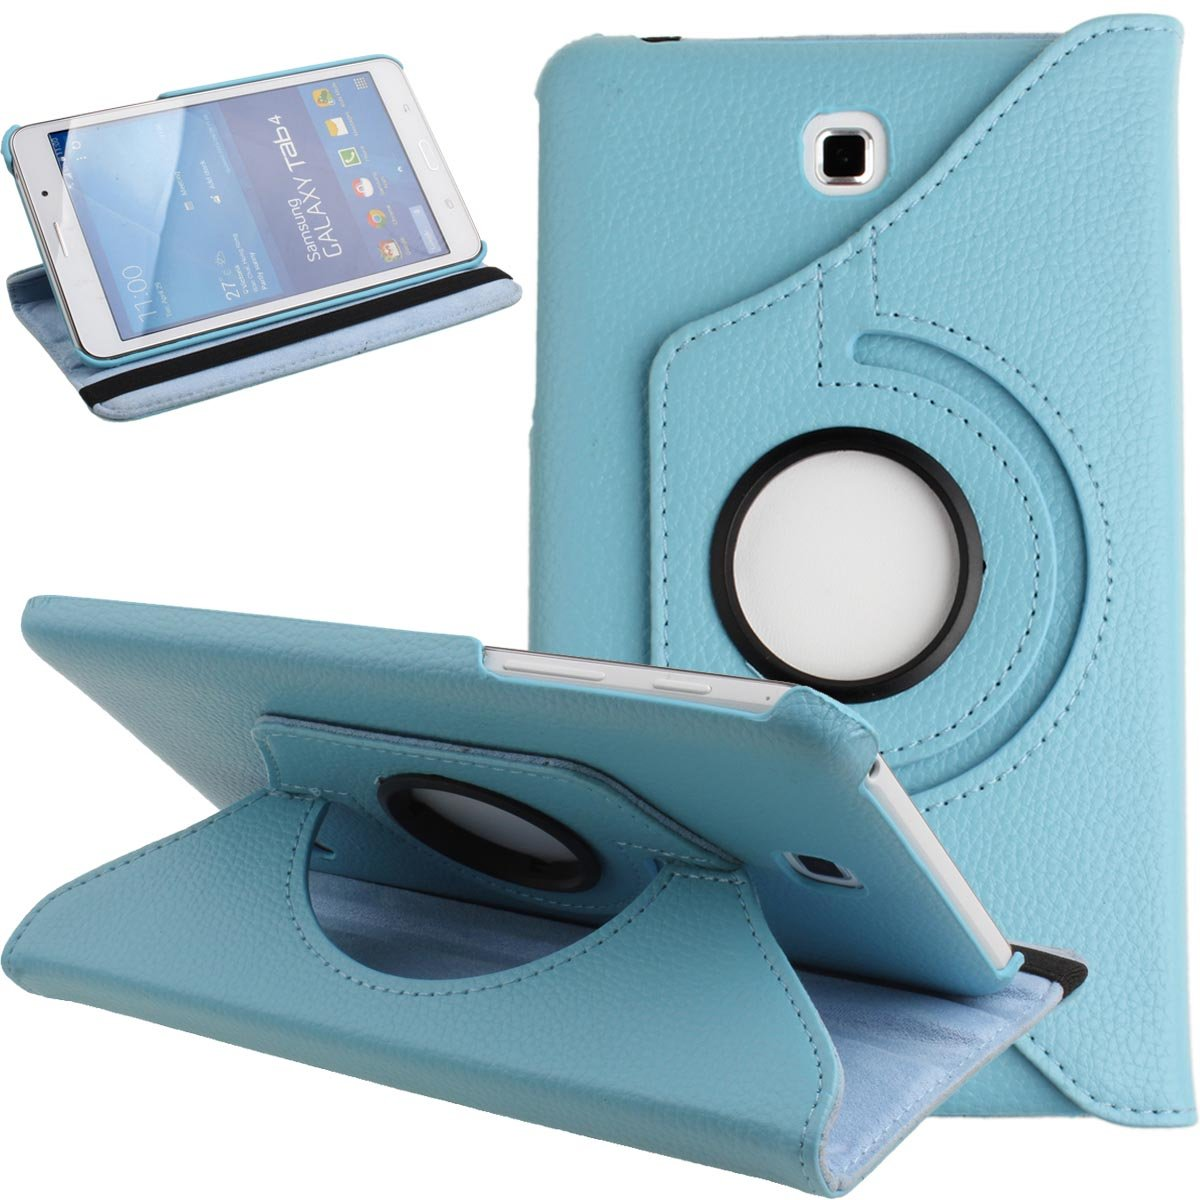 Funda For Samsung Galaxy Tab 4 7.0 T230 T235 SM T231 Cover For Samsung Tab 4 7.0